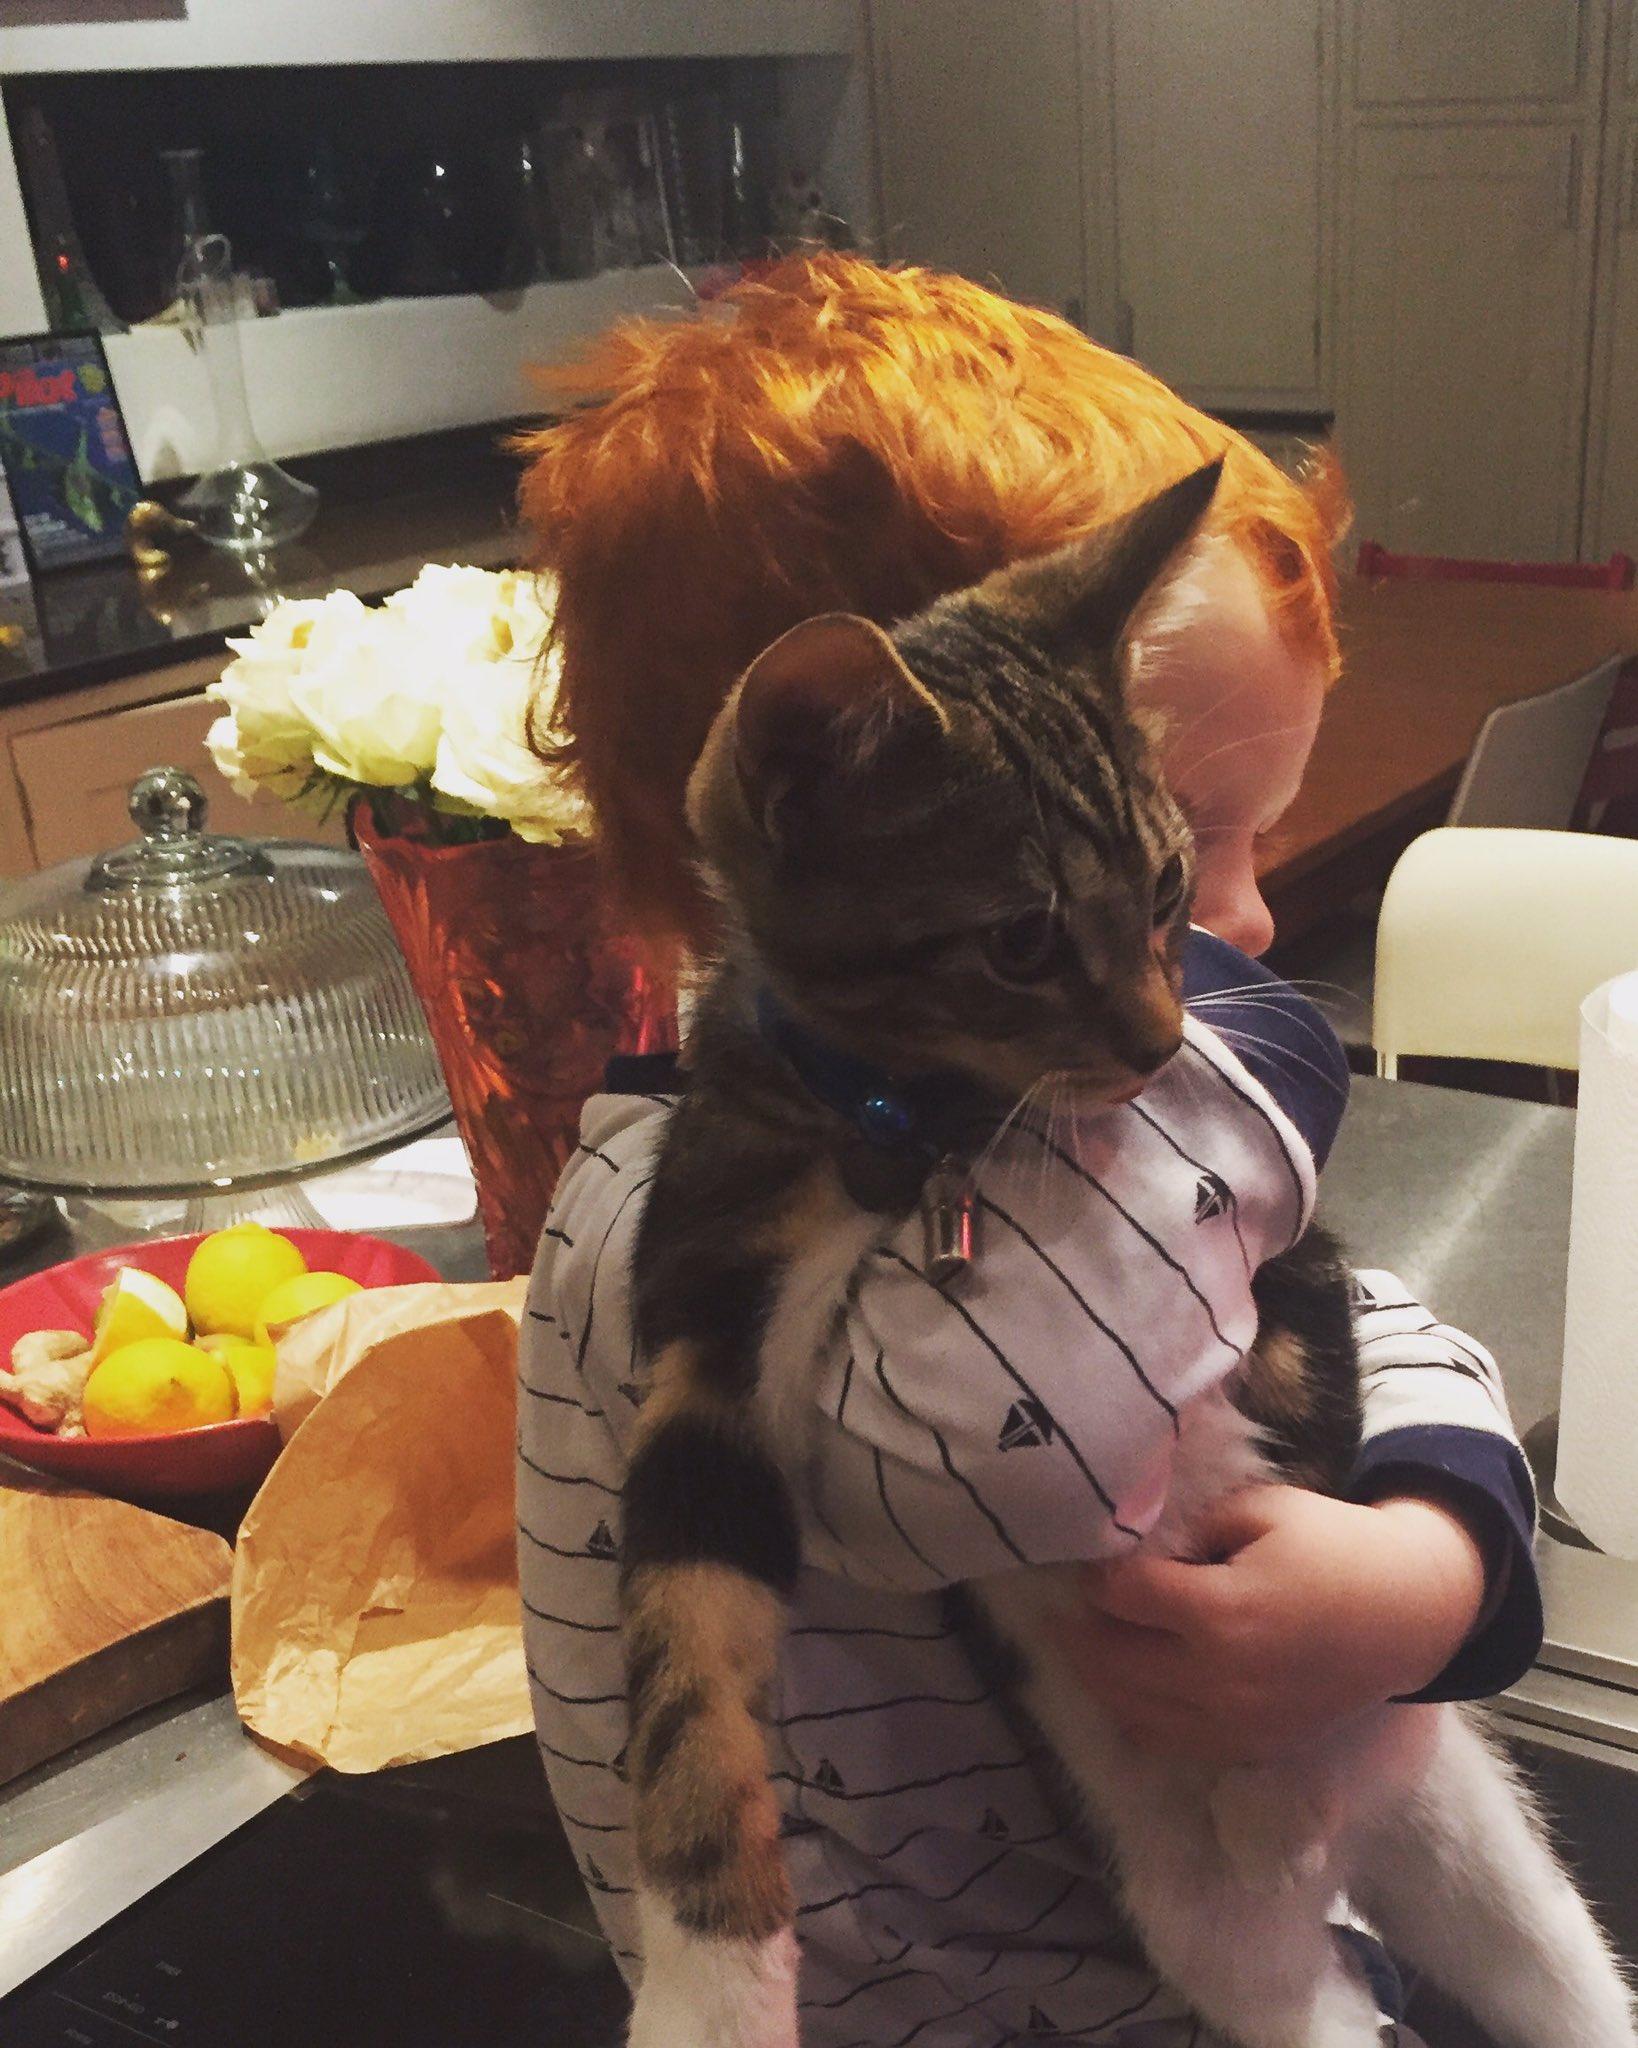 Very tolerant cat 🐱 ❤️👌🏻 https://t.co/PoIYakP9VN